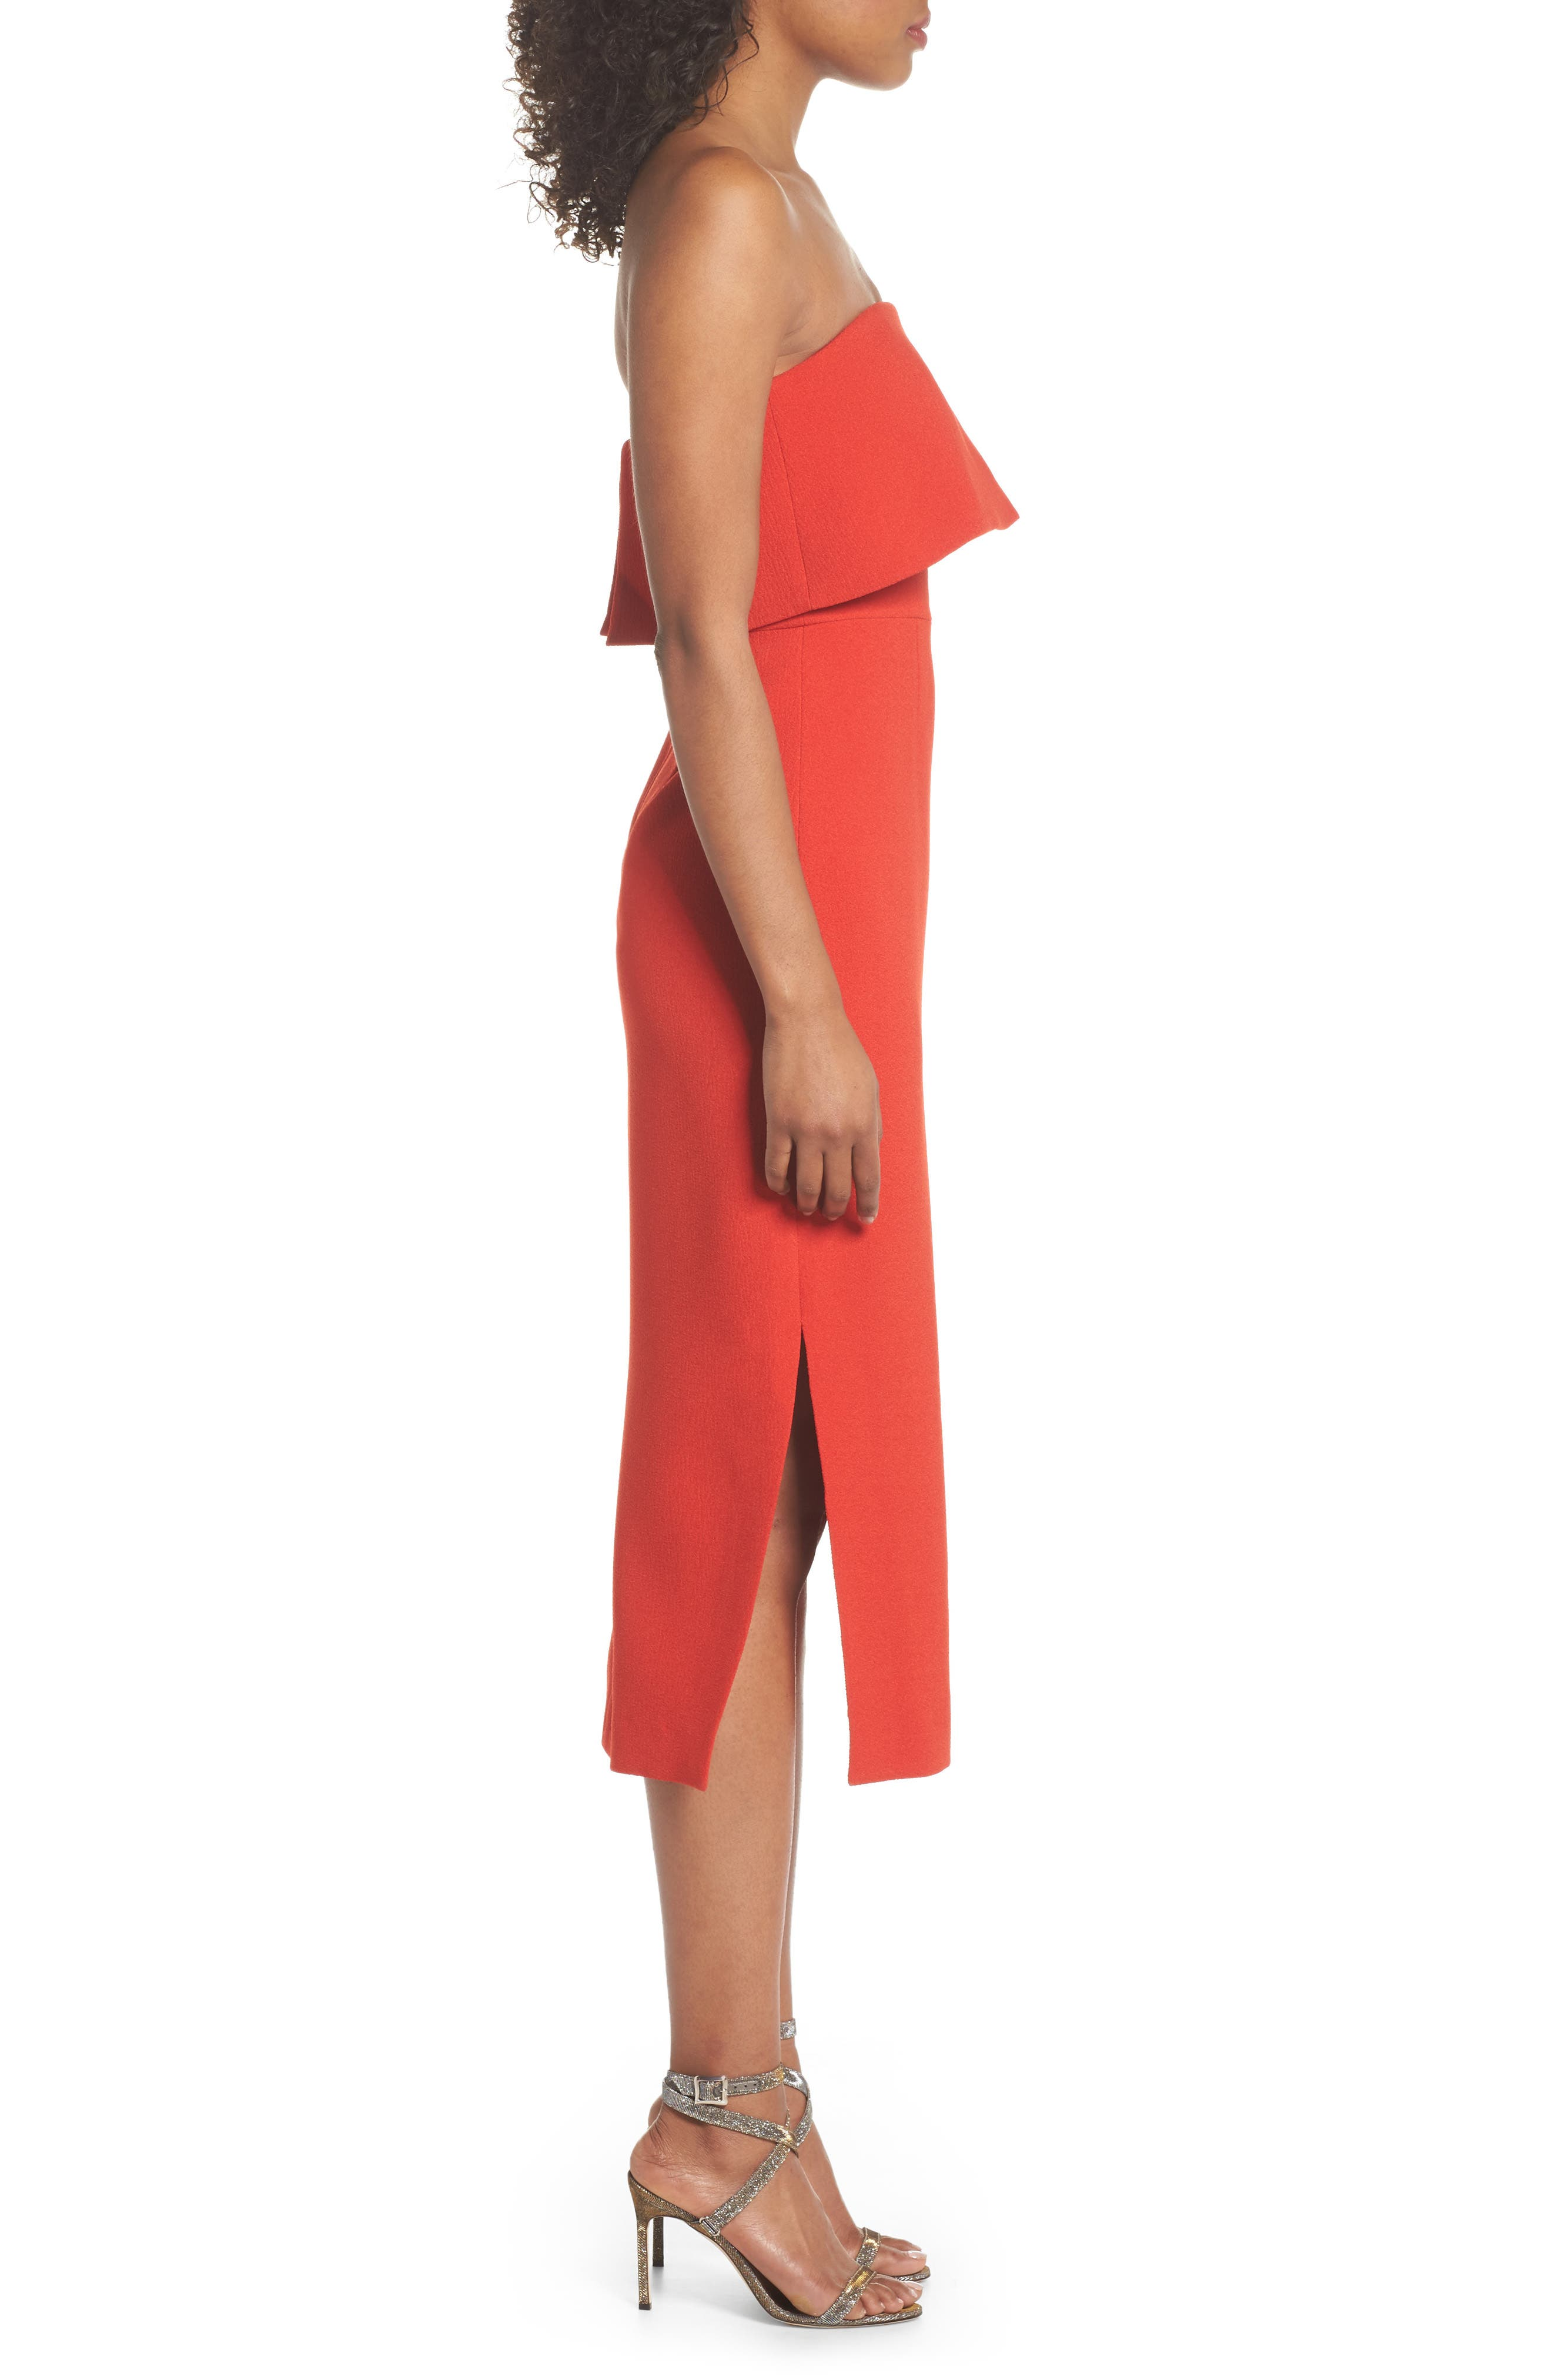 Entice Strapless Midi Dress,                             Alternate thumbnail 3, color,                             Red